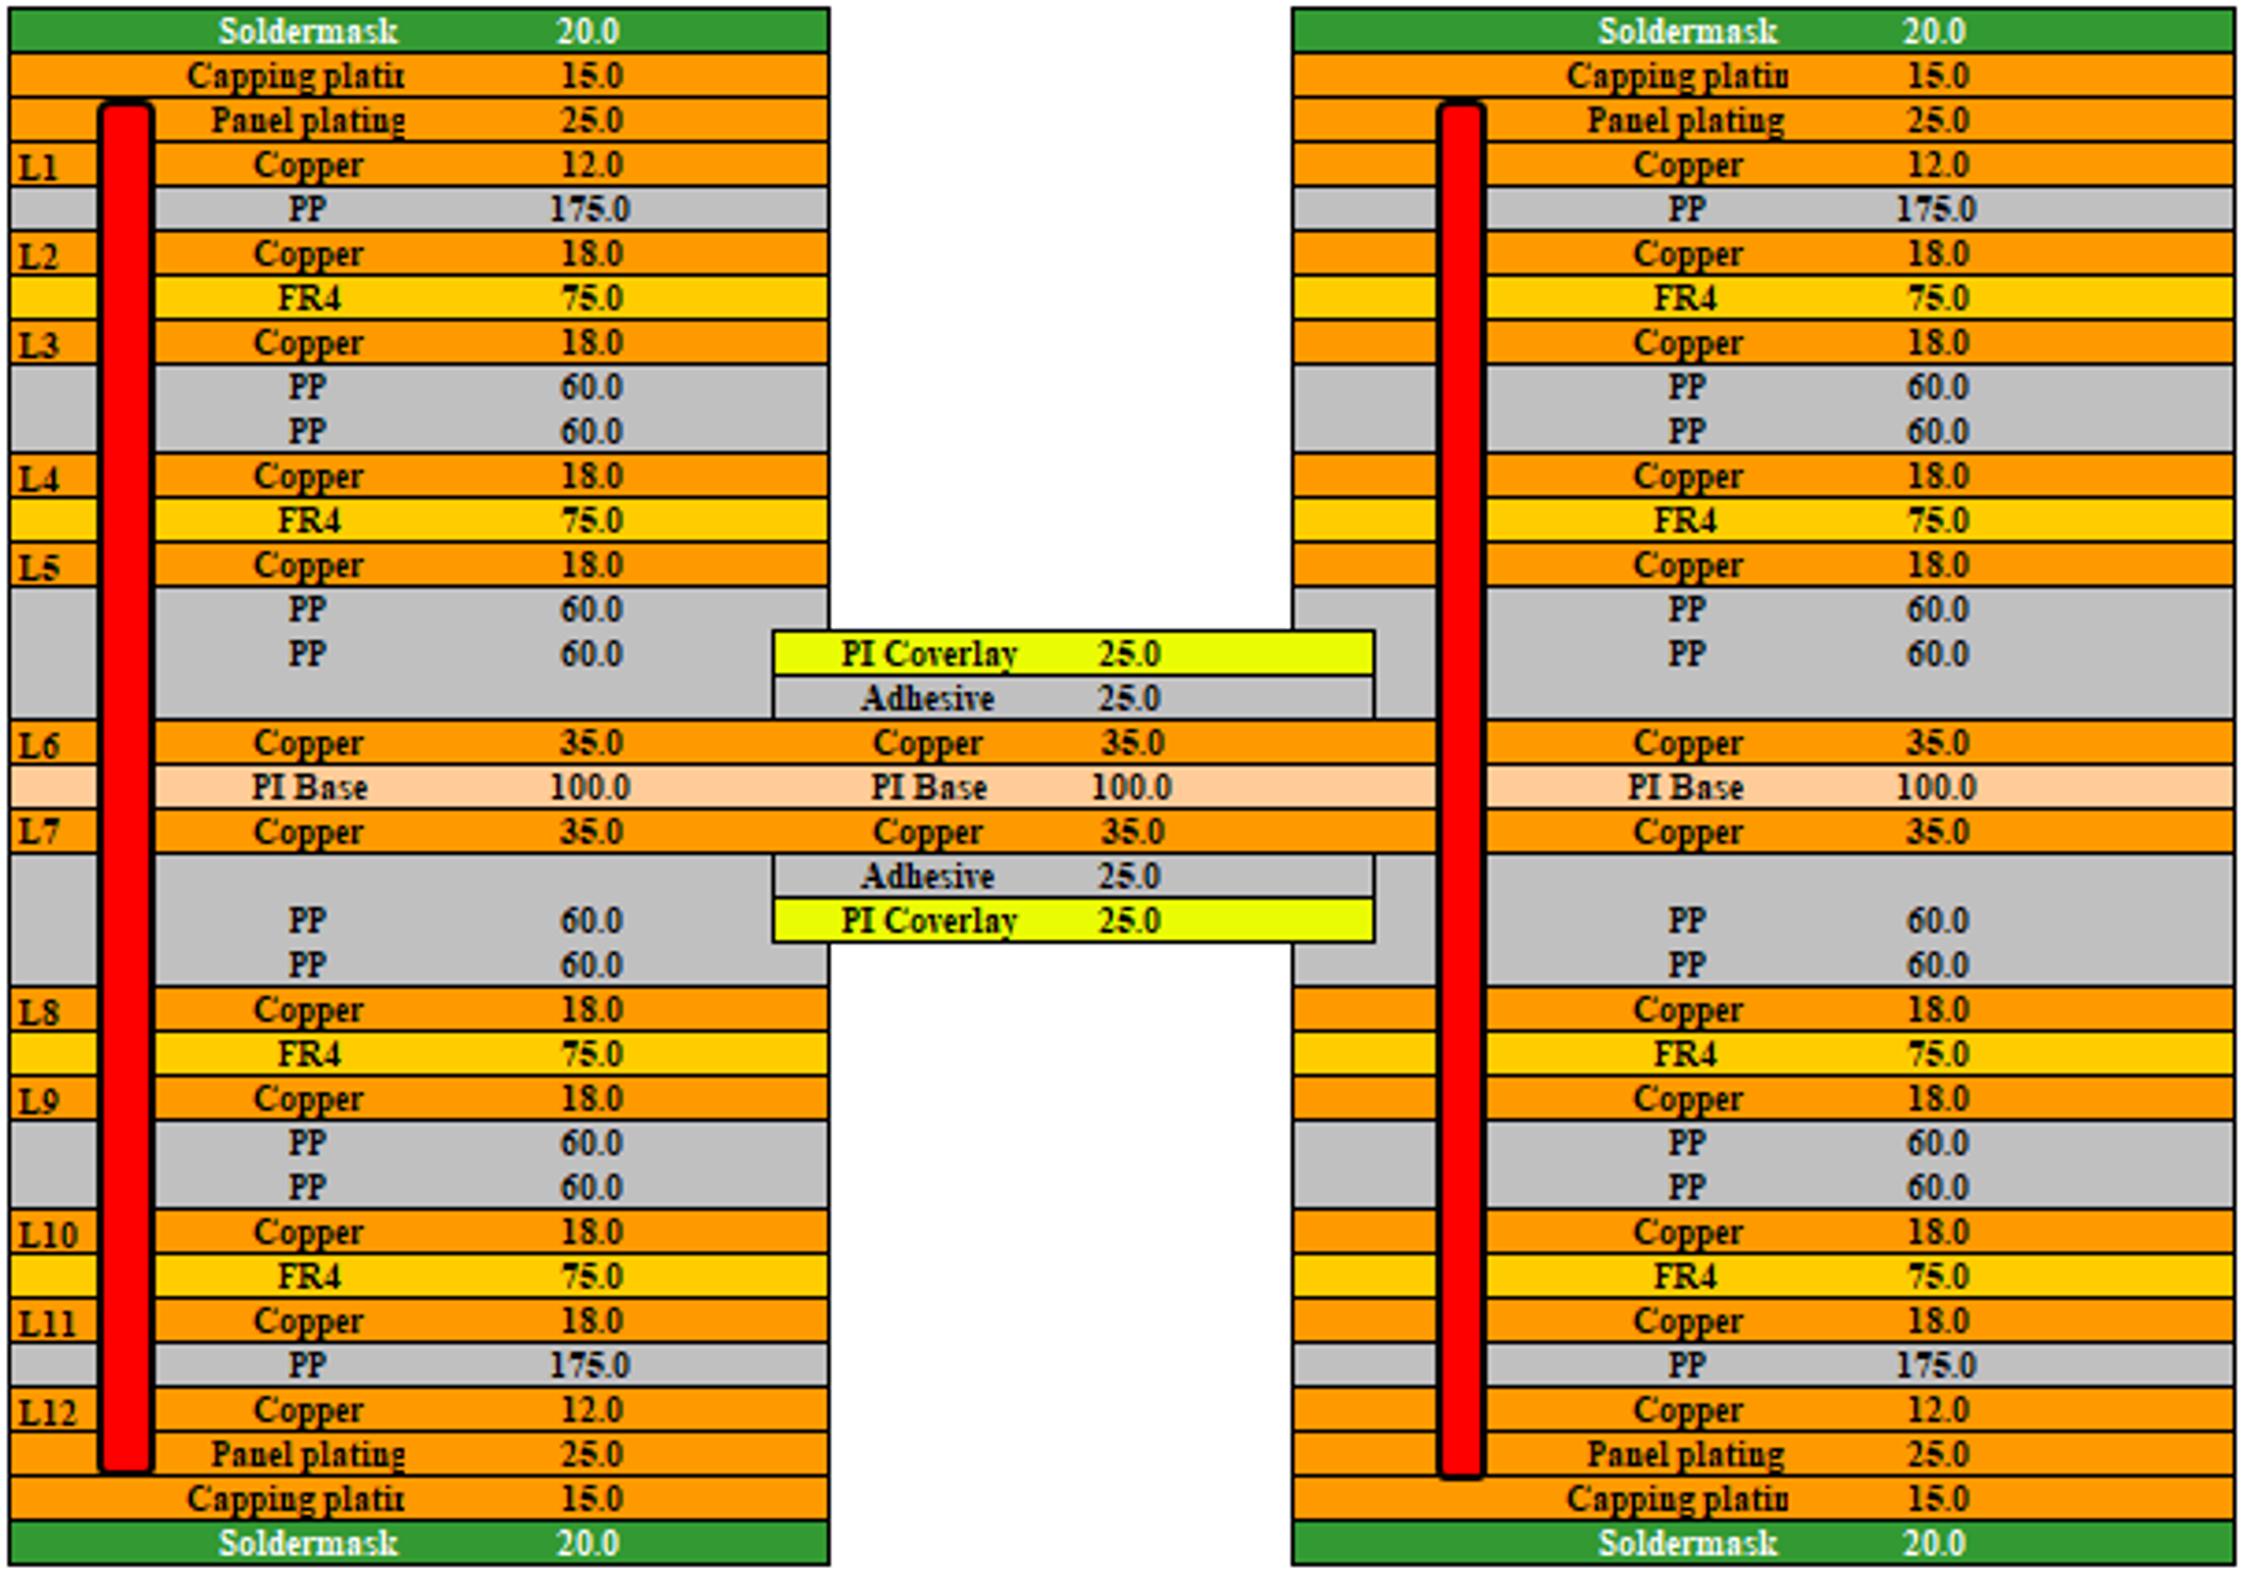 15 Lamination structure rigid flex PCB - High-frequency and high-speed rigid flex PCB